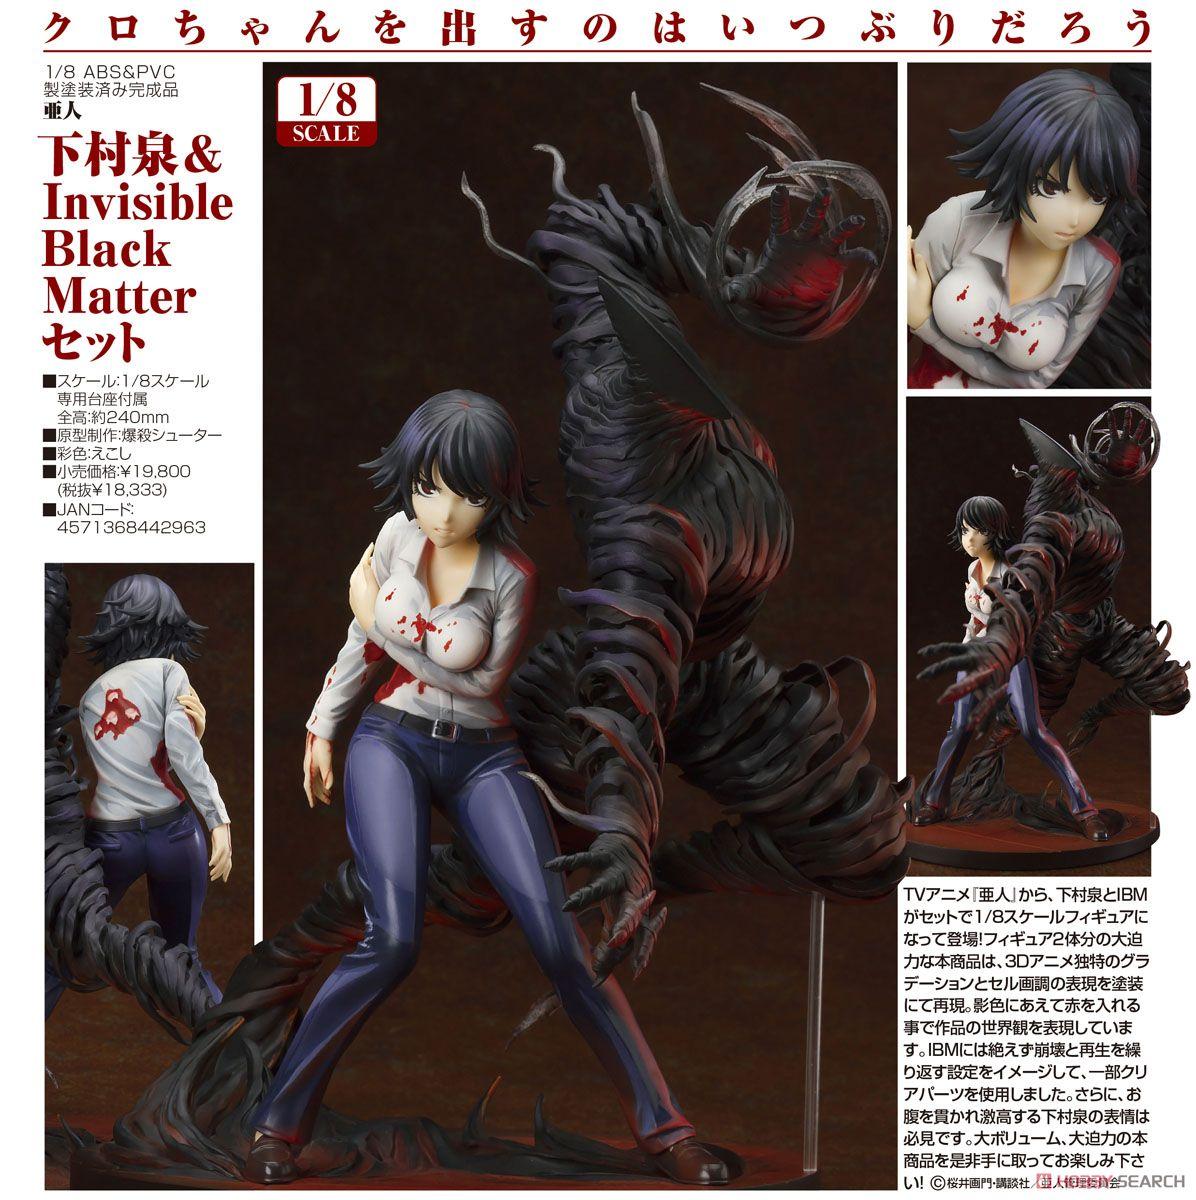 Ajin: Demi-Human - Izumi Shimomura & Invisible Black Matter 1/8 Figurer